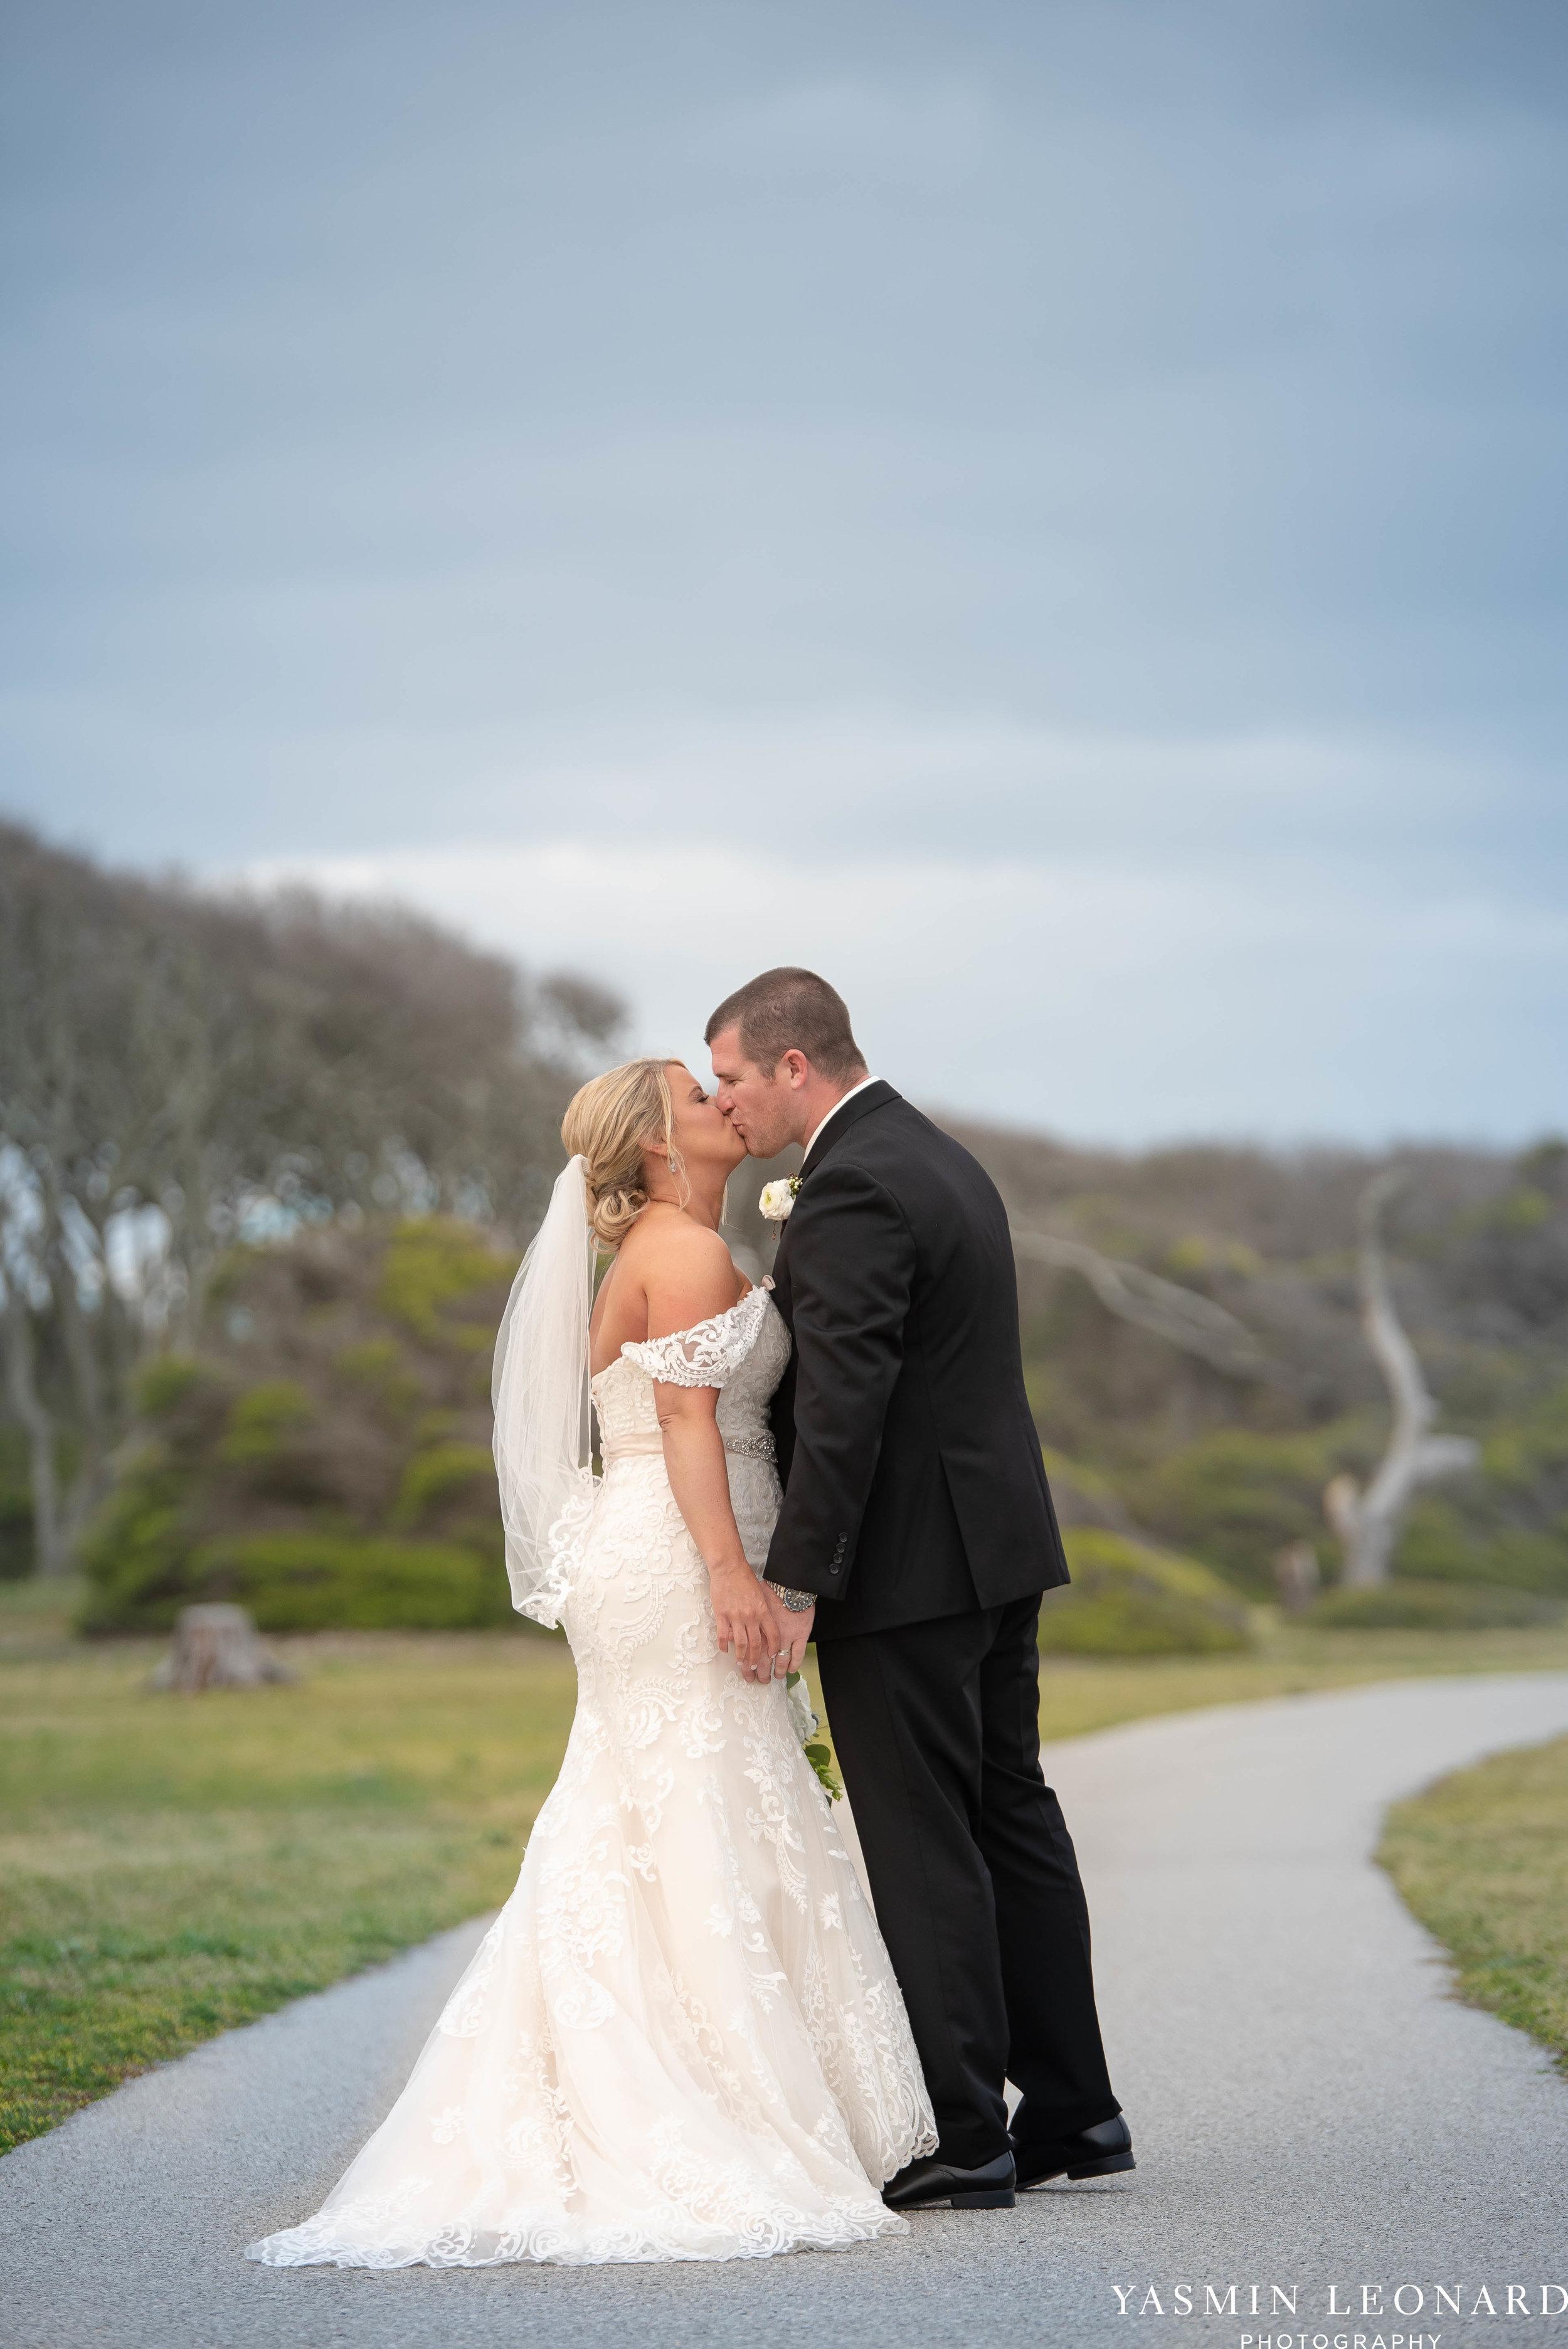 Carolina Beach Wedding - Fort Fisher Wedding - NC Acquarium - Beach Wedding - NC Wedding - Beach Wedding Inspiration - Beach Bride-29.jpg